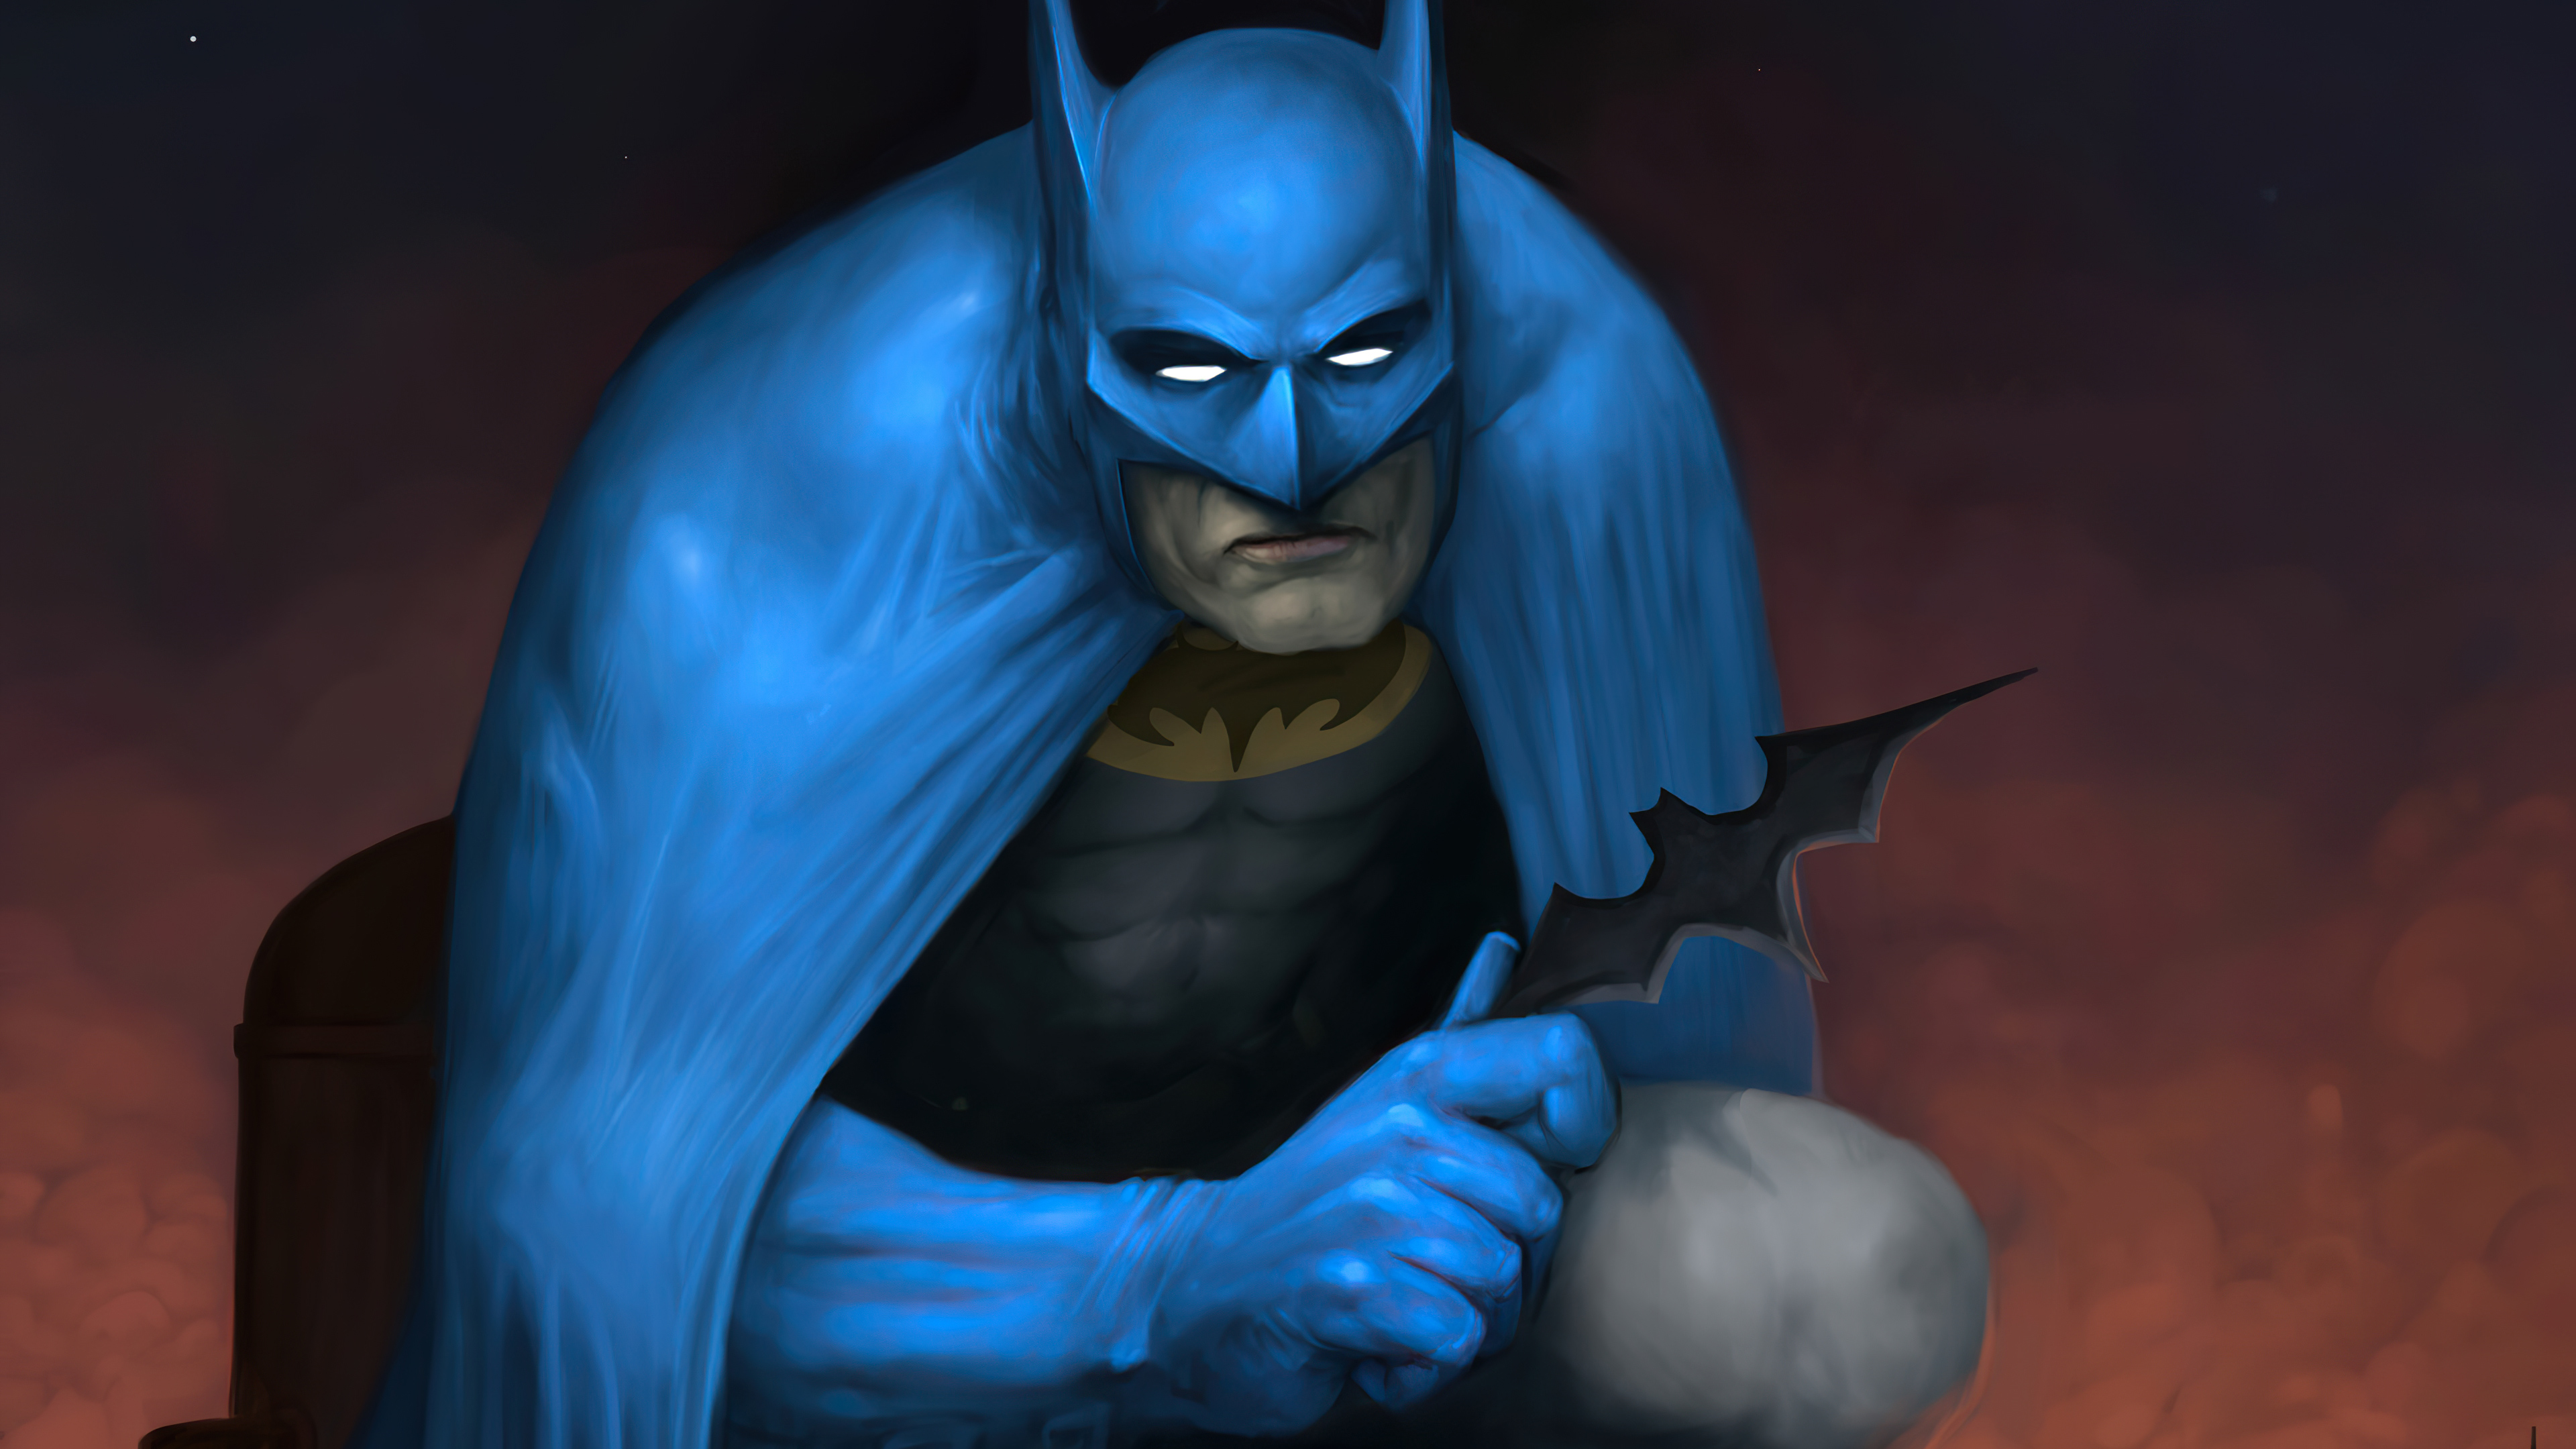 Wallpaper Batman with old suit